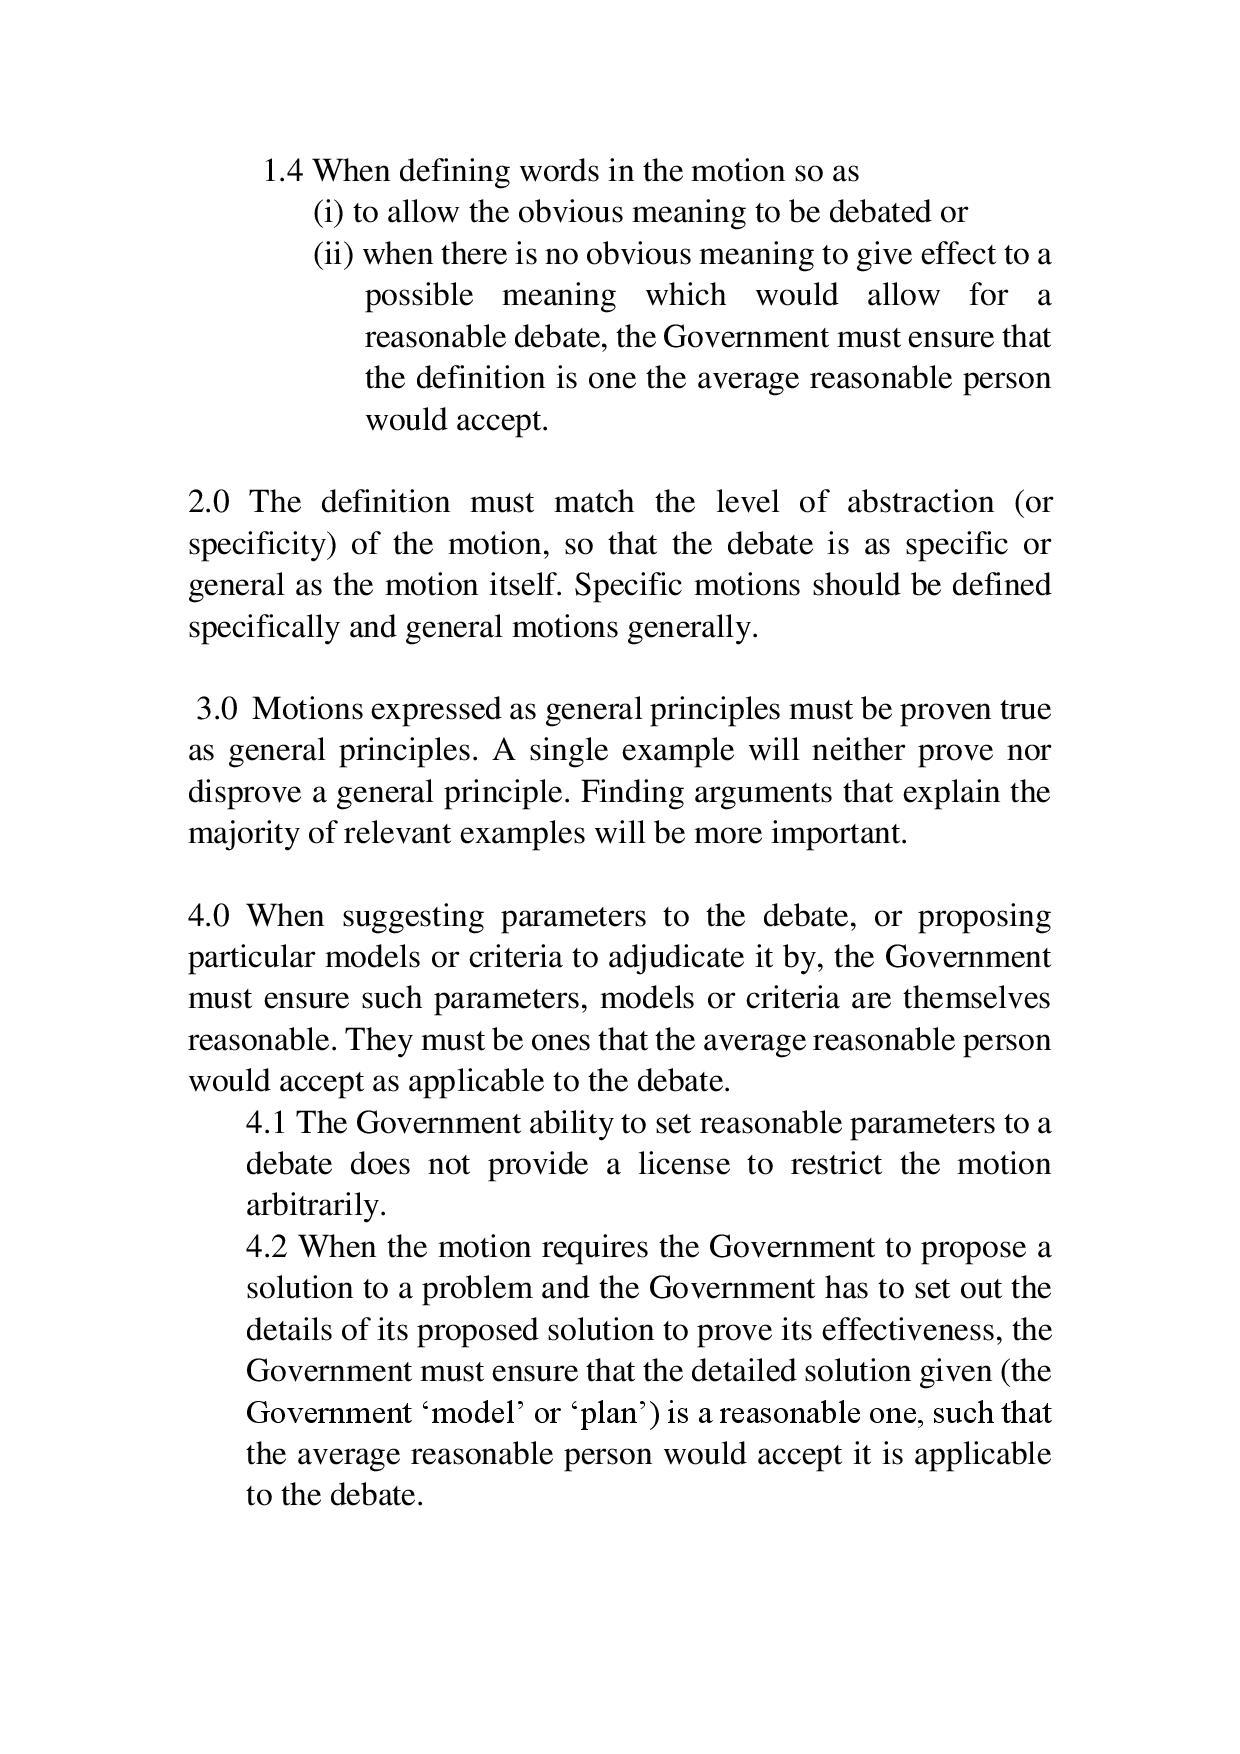 MALAYSIAN DENTAL INTERVARSITY DEBATE COMPETITION (Edited)-page-012.jpg